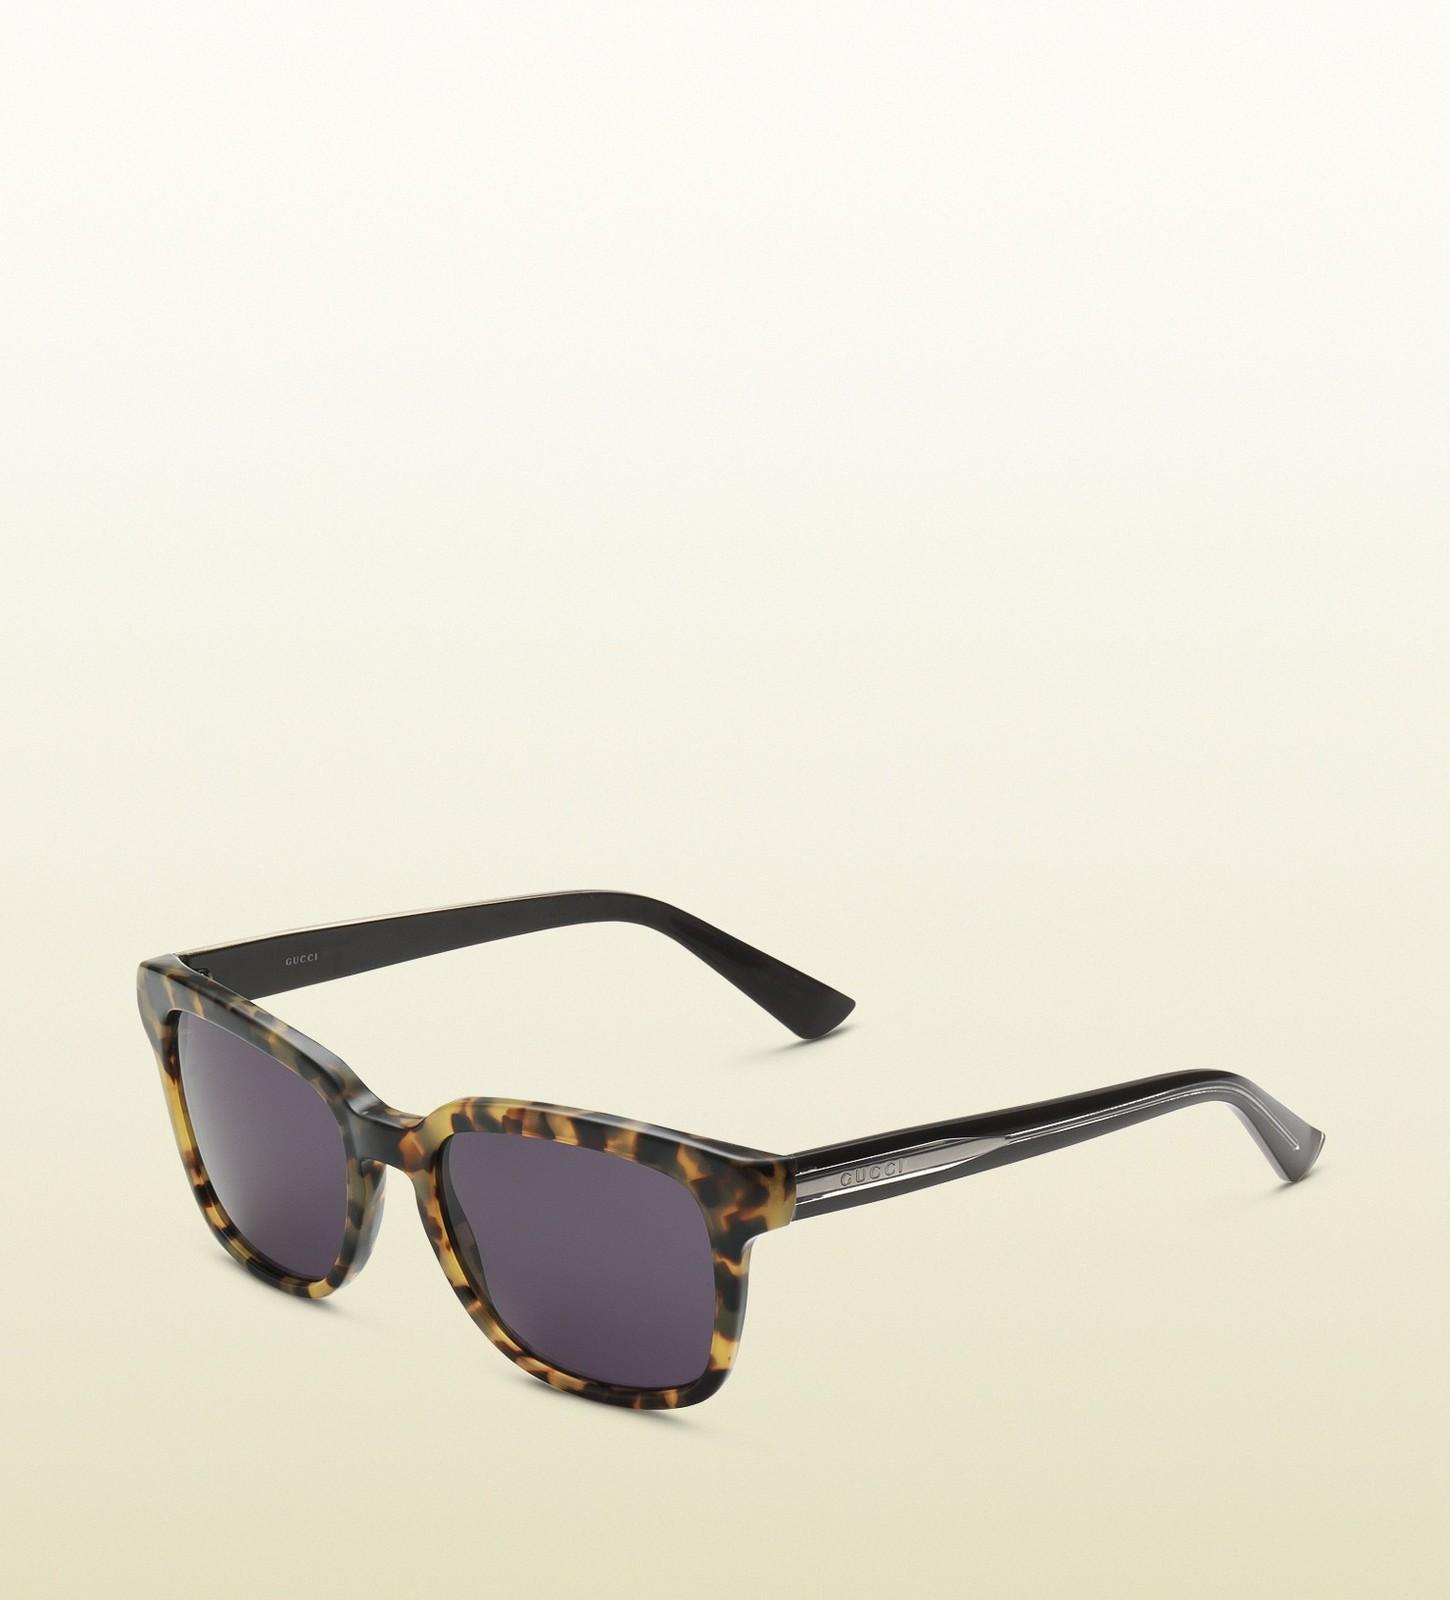 Gucci Square vintage style sunglasses